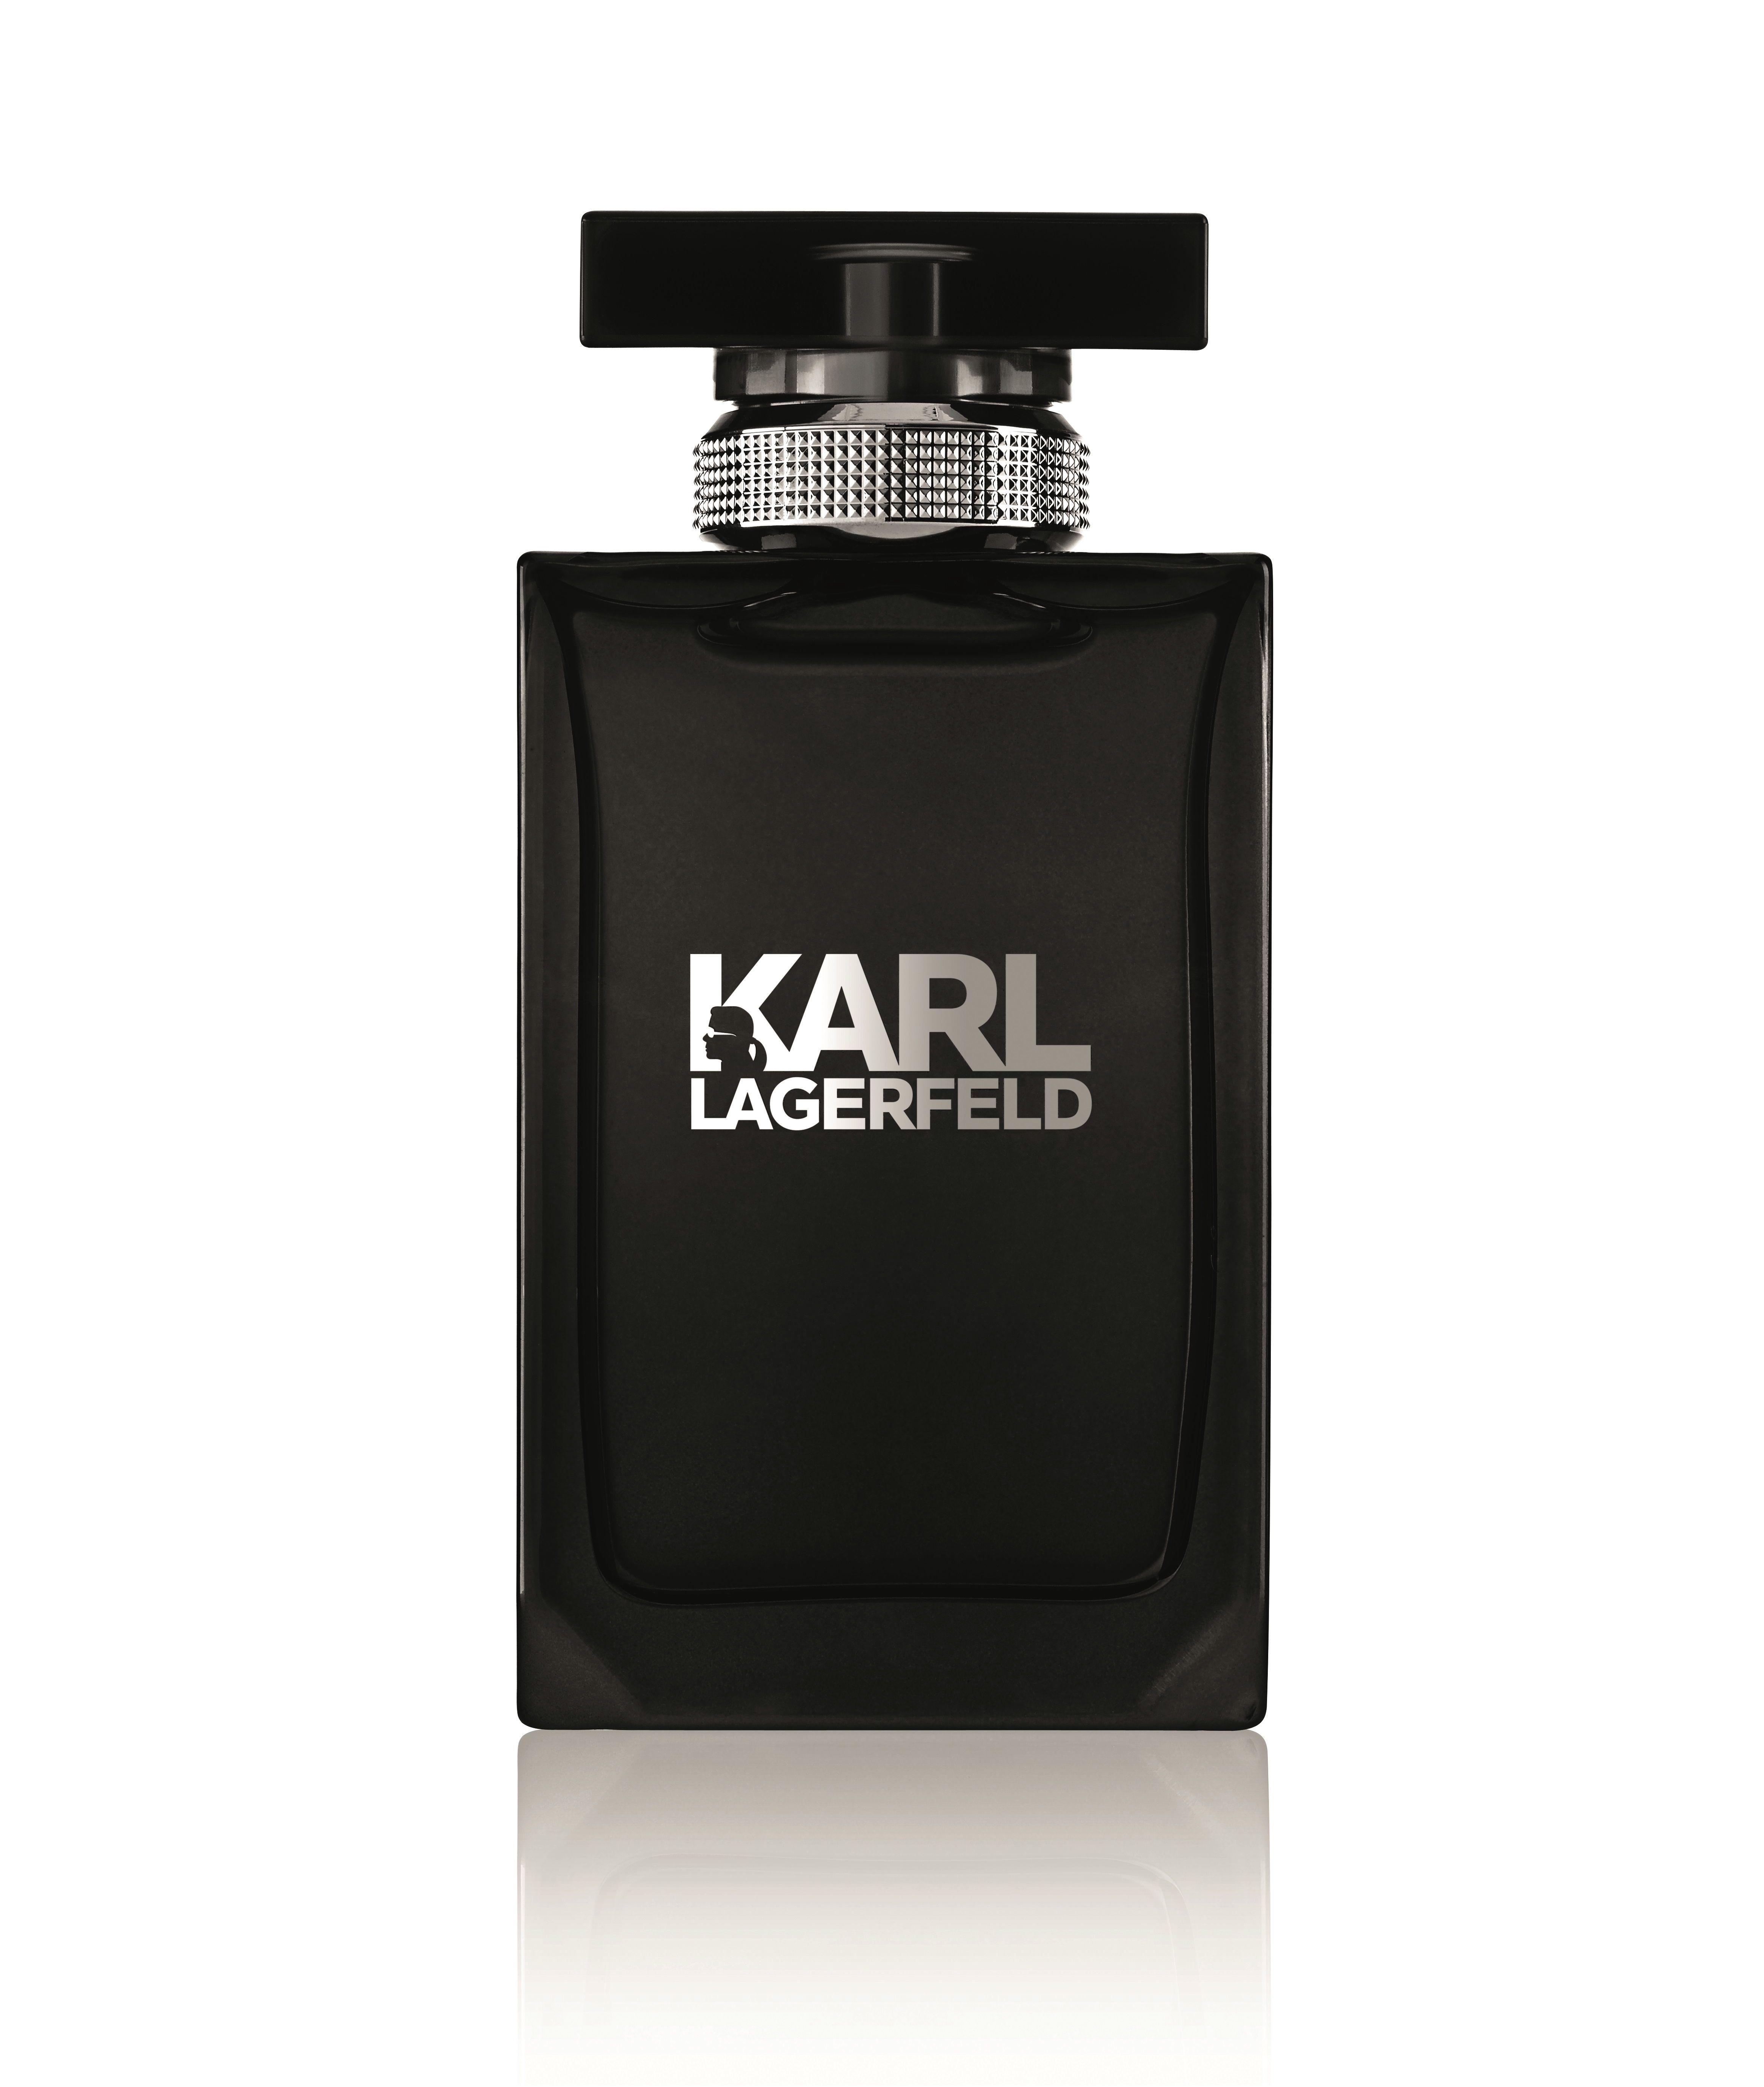 Fragrances Perfume Bottle And Perfume Bottles: The Grooming Guru